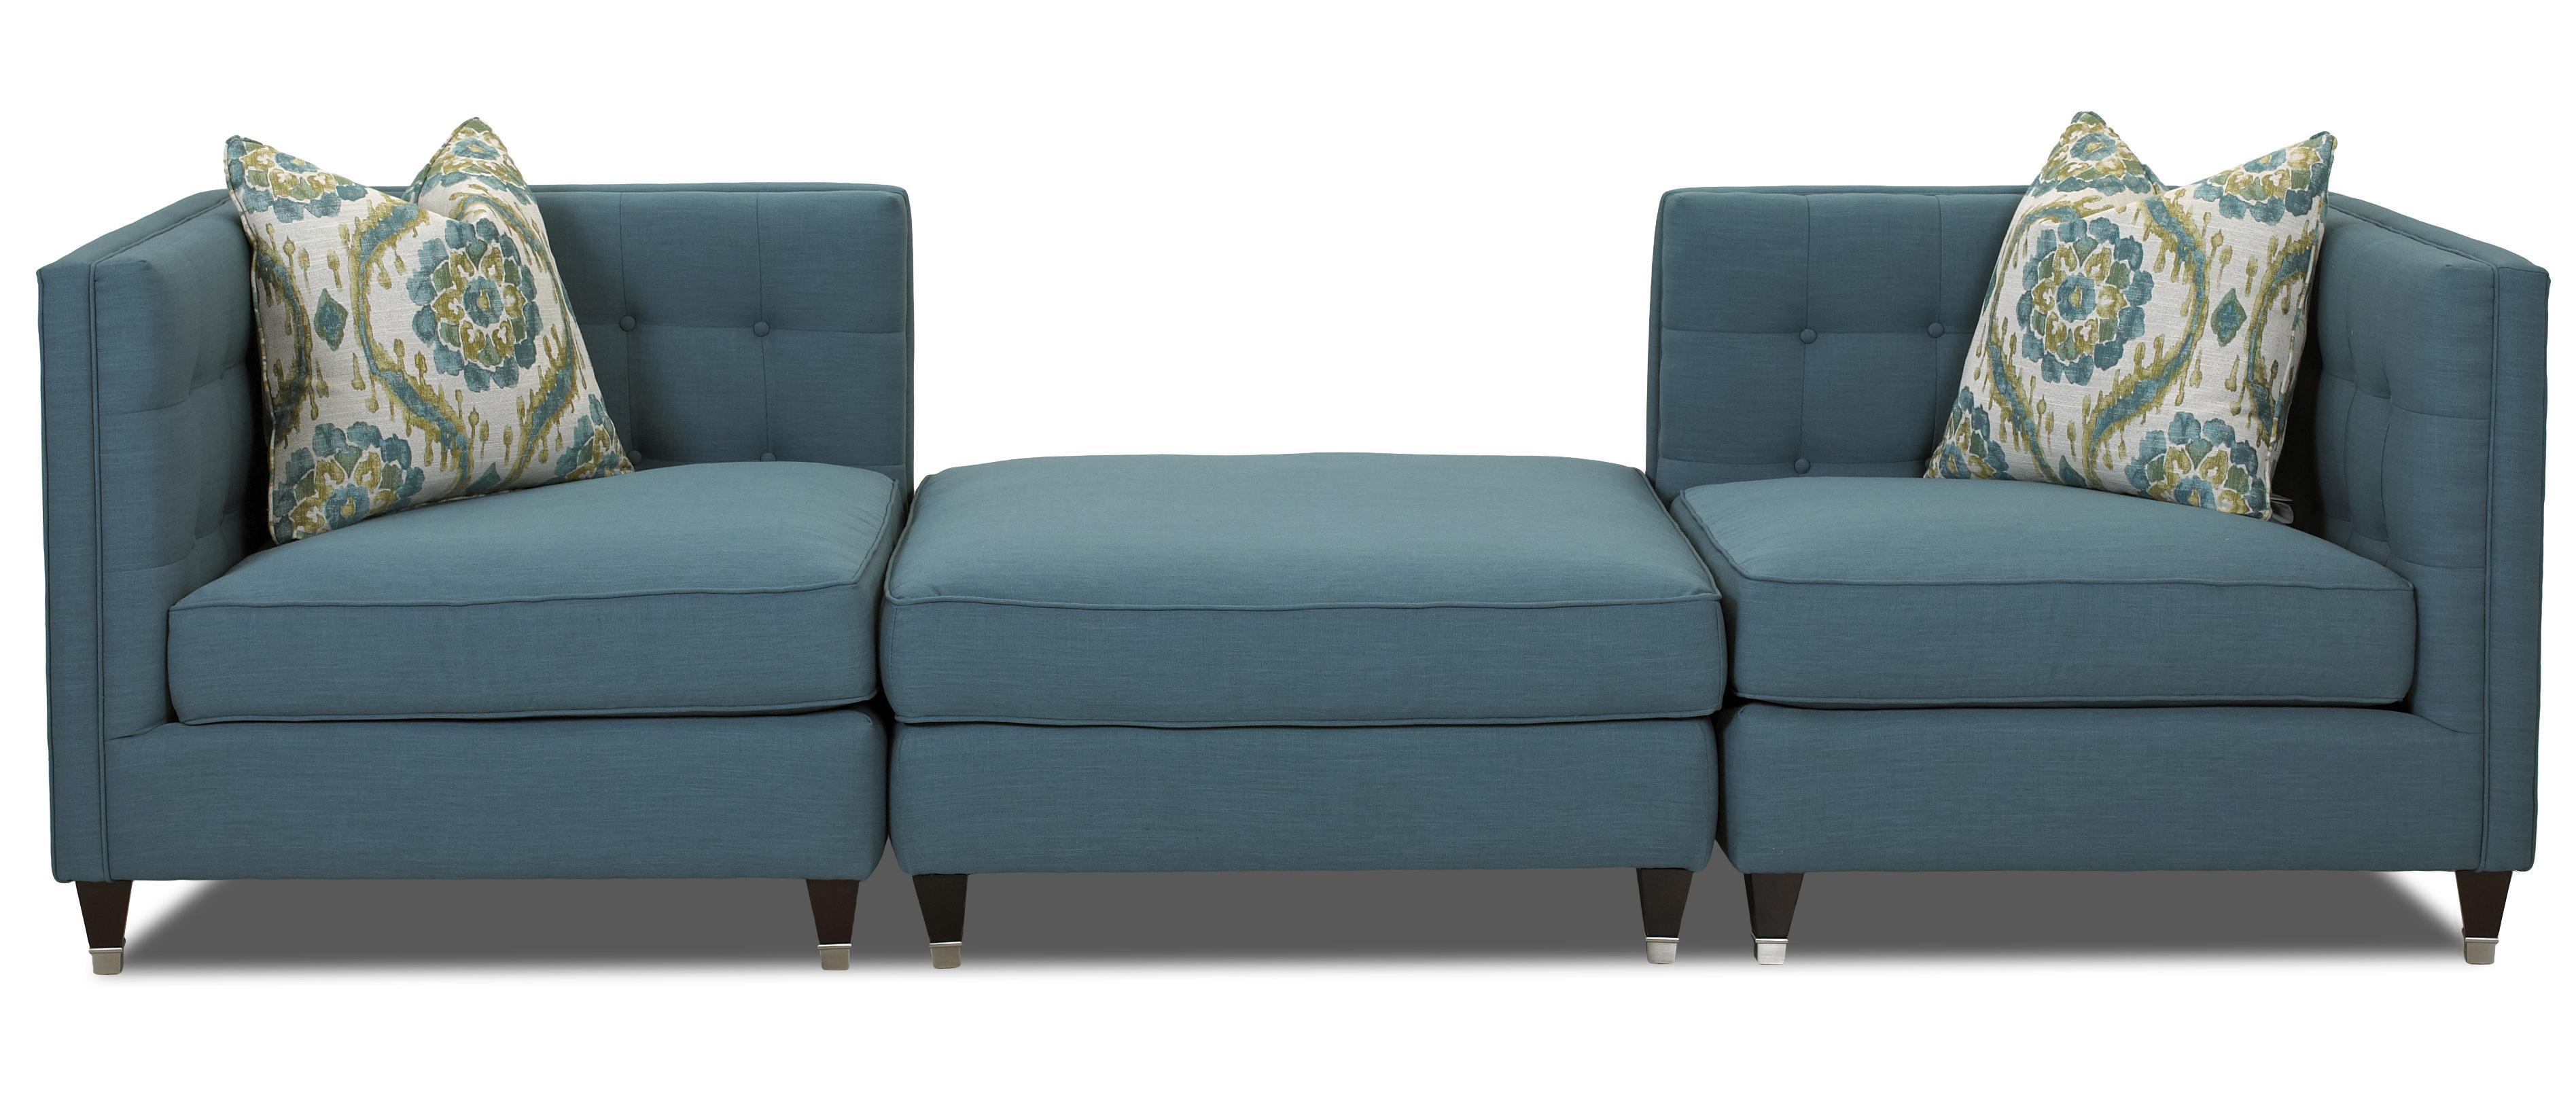 Klaussner Celeste Contemporary Three Piece Sectional Sofa - Item Number: D73800 CORN+OTTO+CORNER